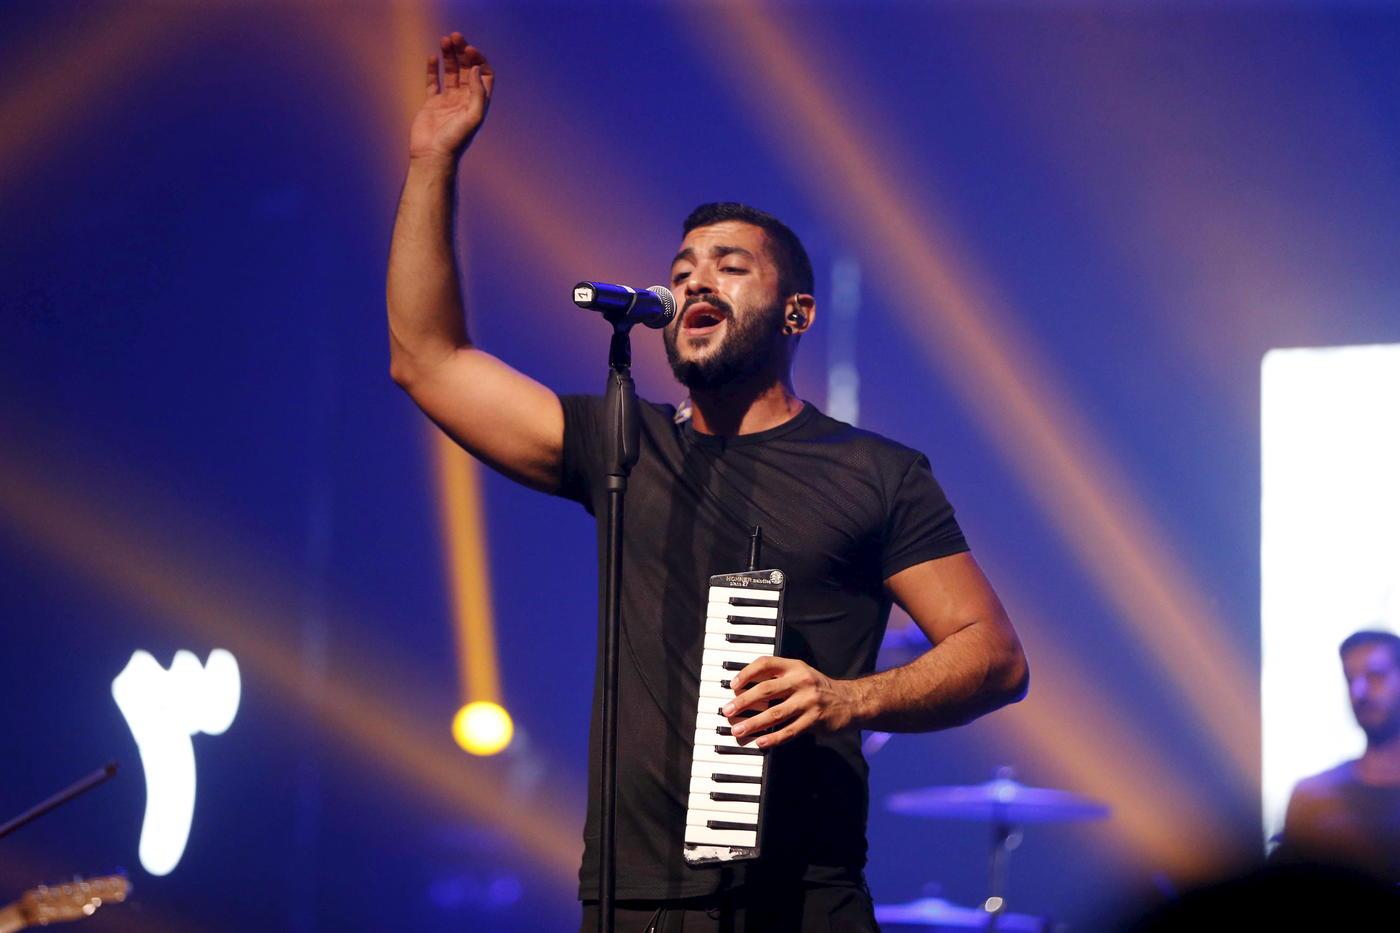 Mashrou' Leila blasphemy row: Byblos show cancelled over